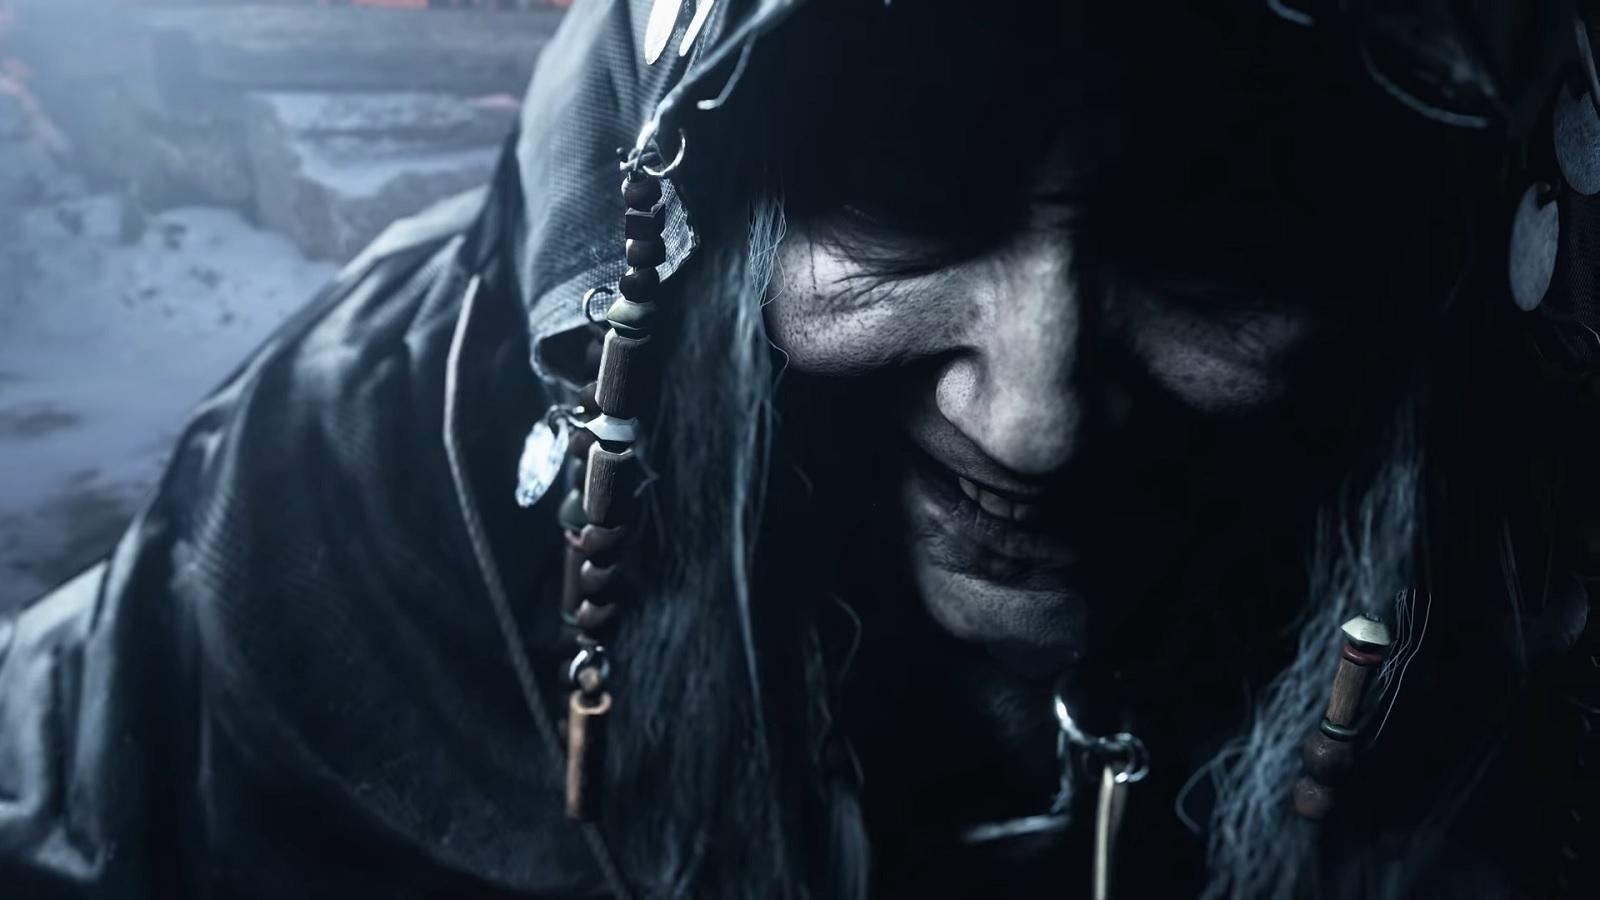 Слухи: Capcom начала разработку Resident Evil 9 ещё в конце 2018 года